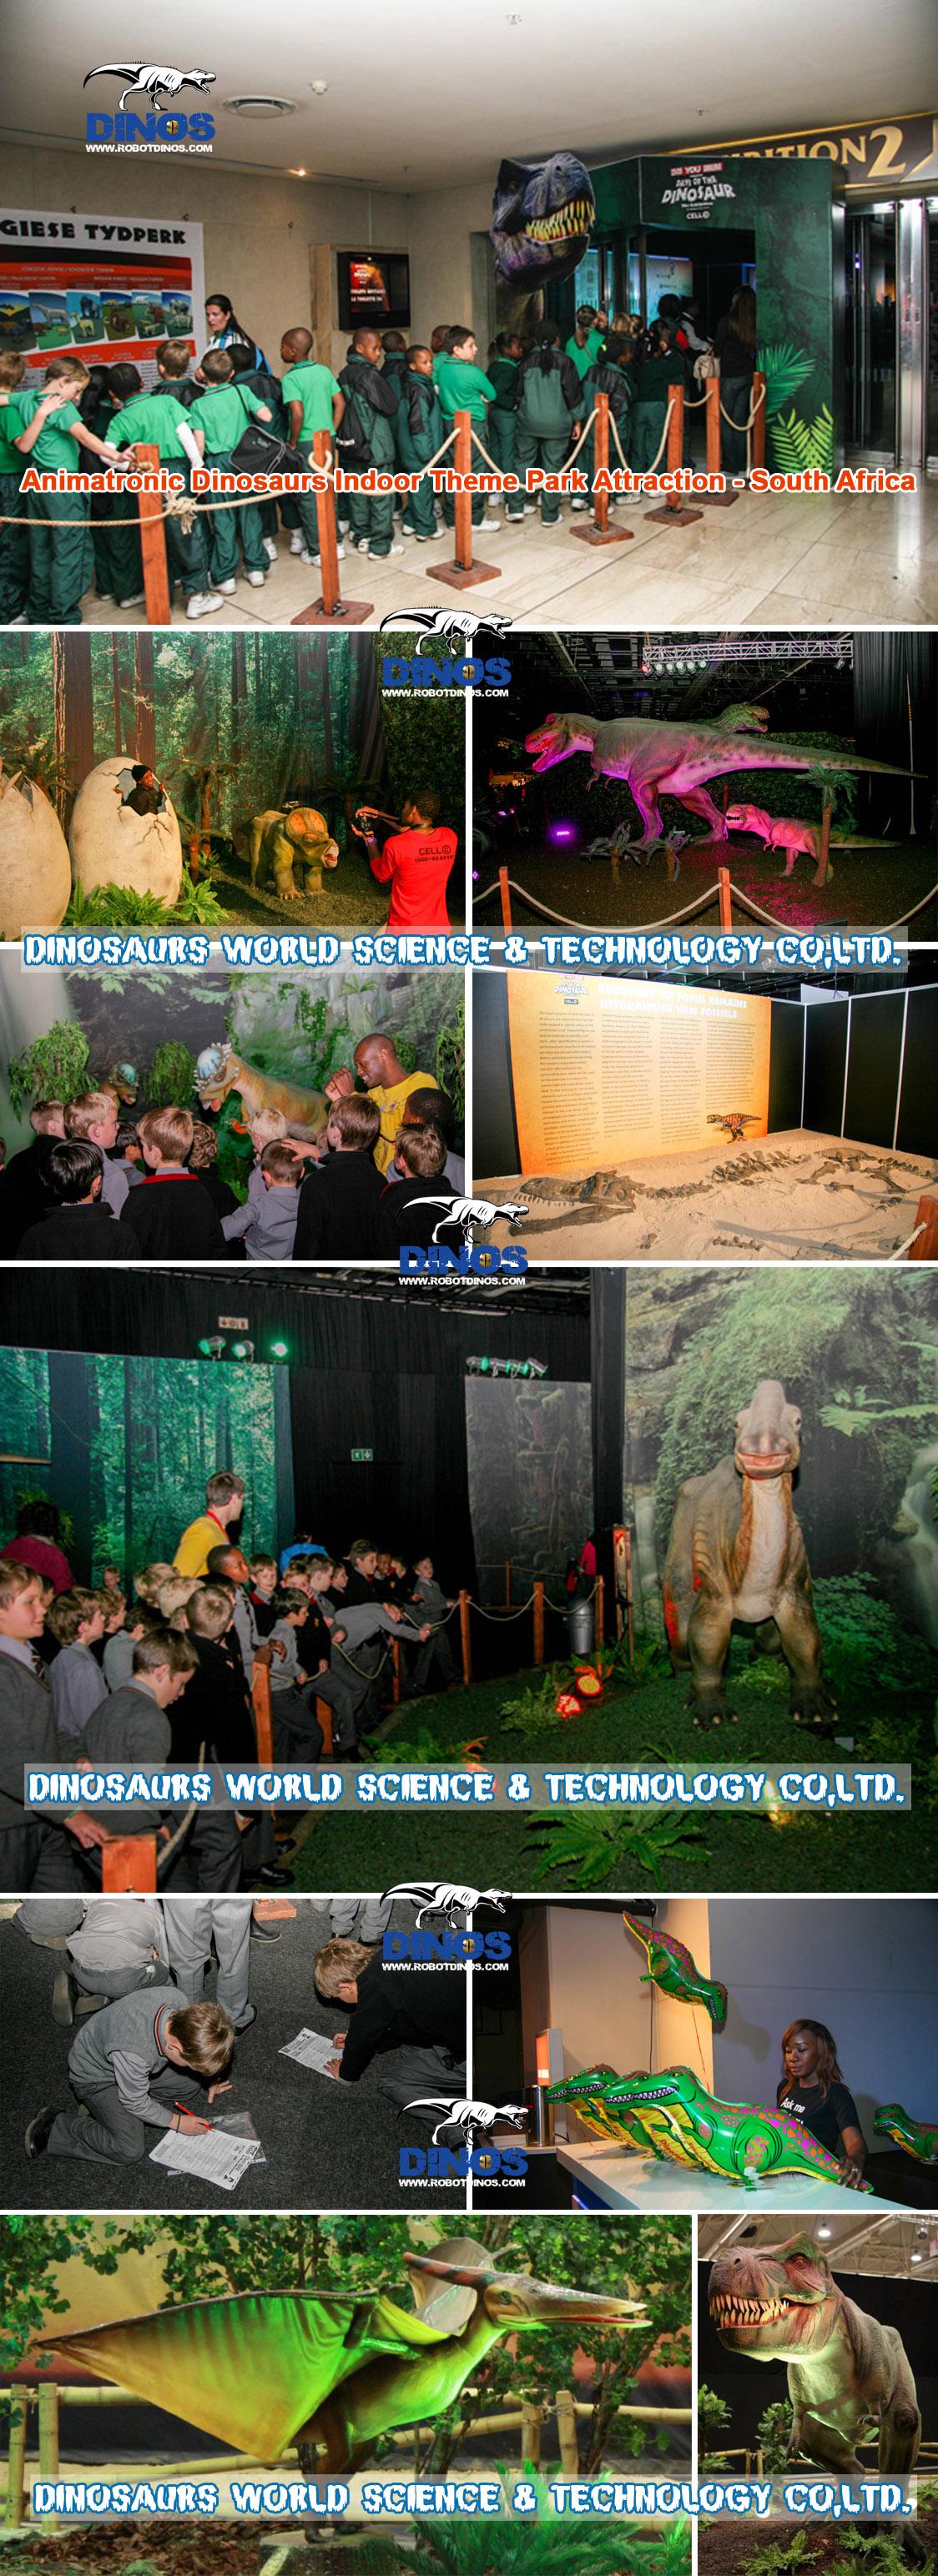 theme park attraction,dinosaurs animatronics,robotic dinosaurs,kids playground equipment,kids ride model,kids ride production,theme park attraction dinosaur,robotic dinos